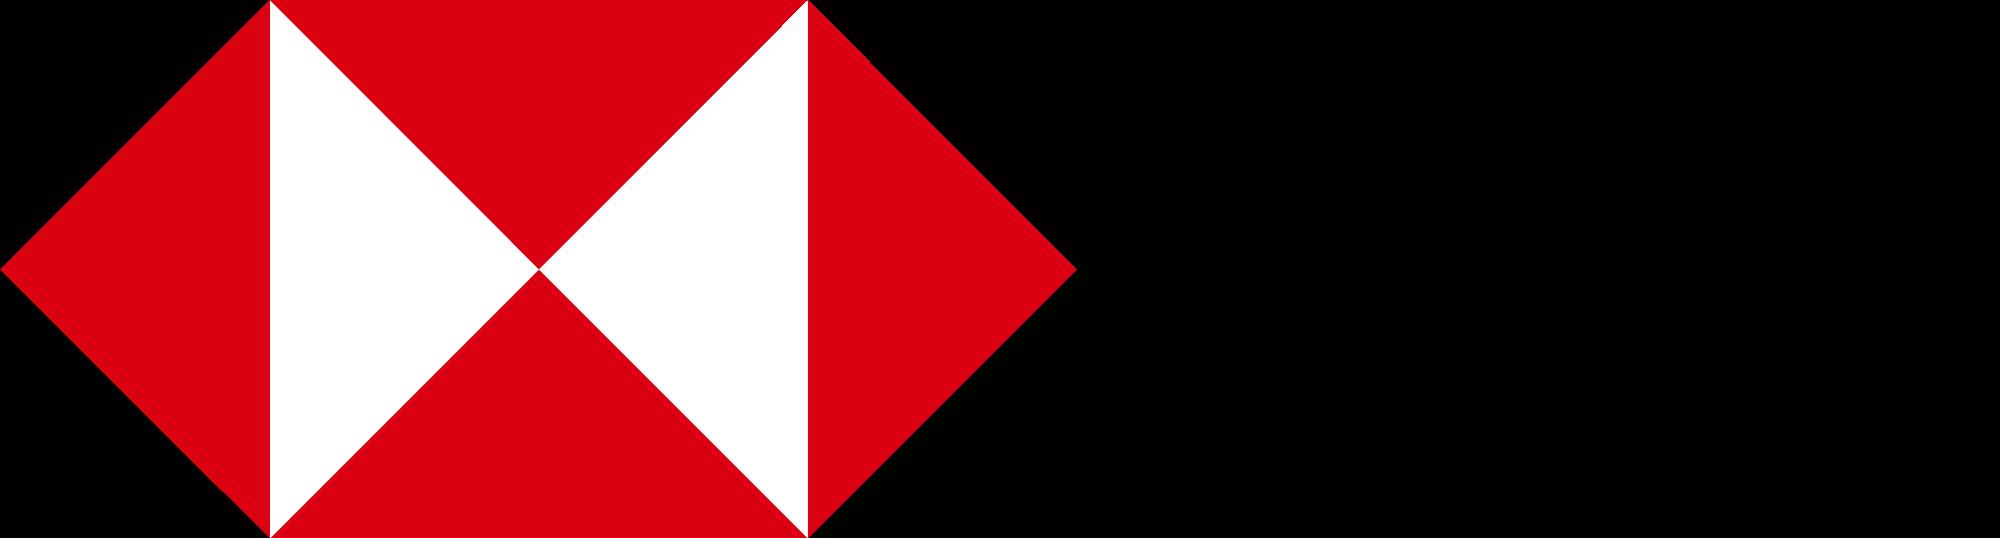 Logotipo de HSBC